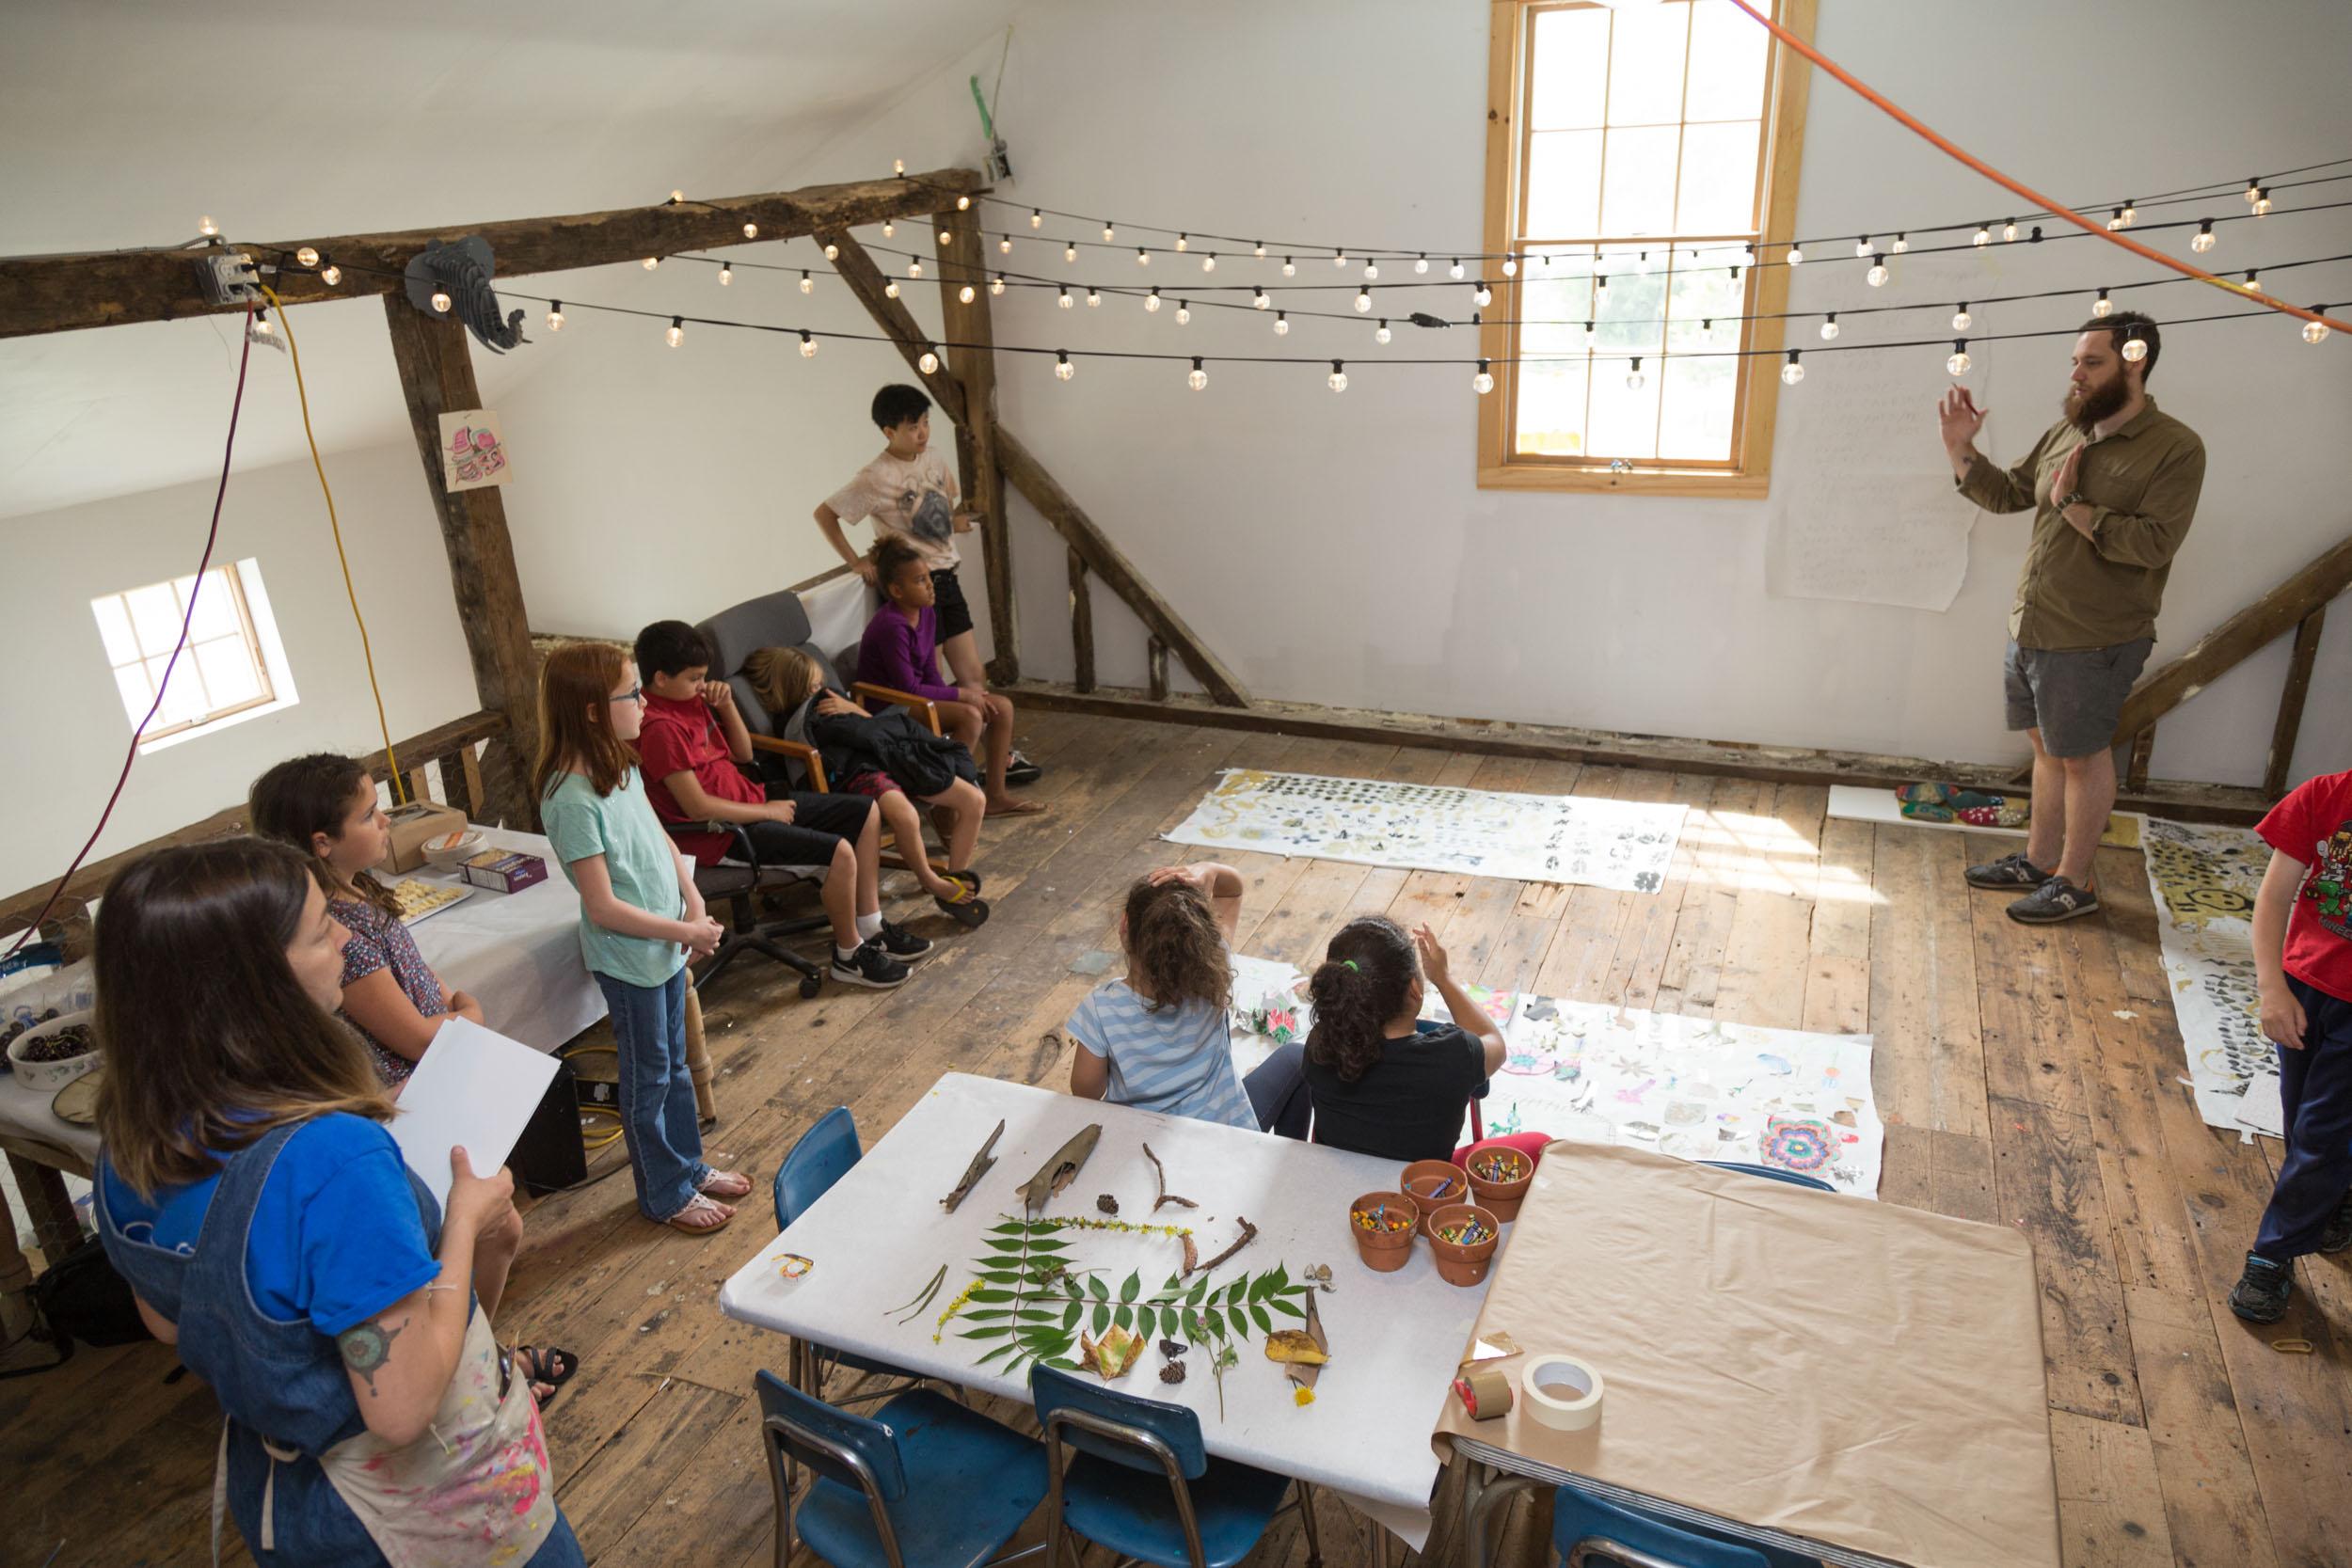 wassaic-project-education-art-scouts-2017-07-29-11-47-52.jpg